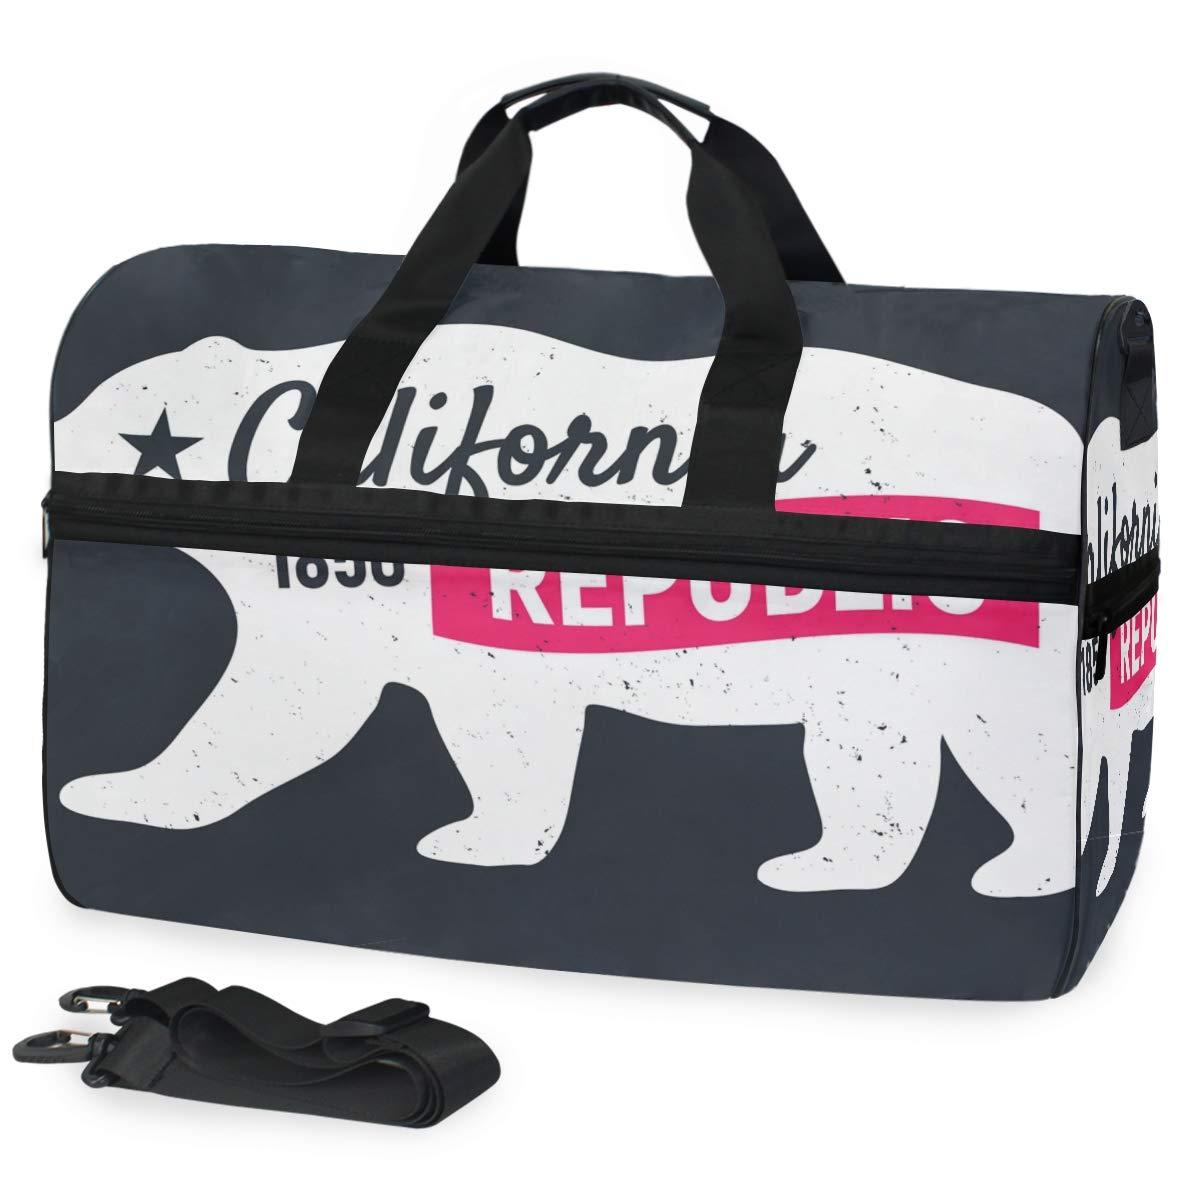 Travel Duffel Bag California Republic Bear Waterproof Lightweight Luggage bag for Sports Gym Vacation